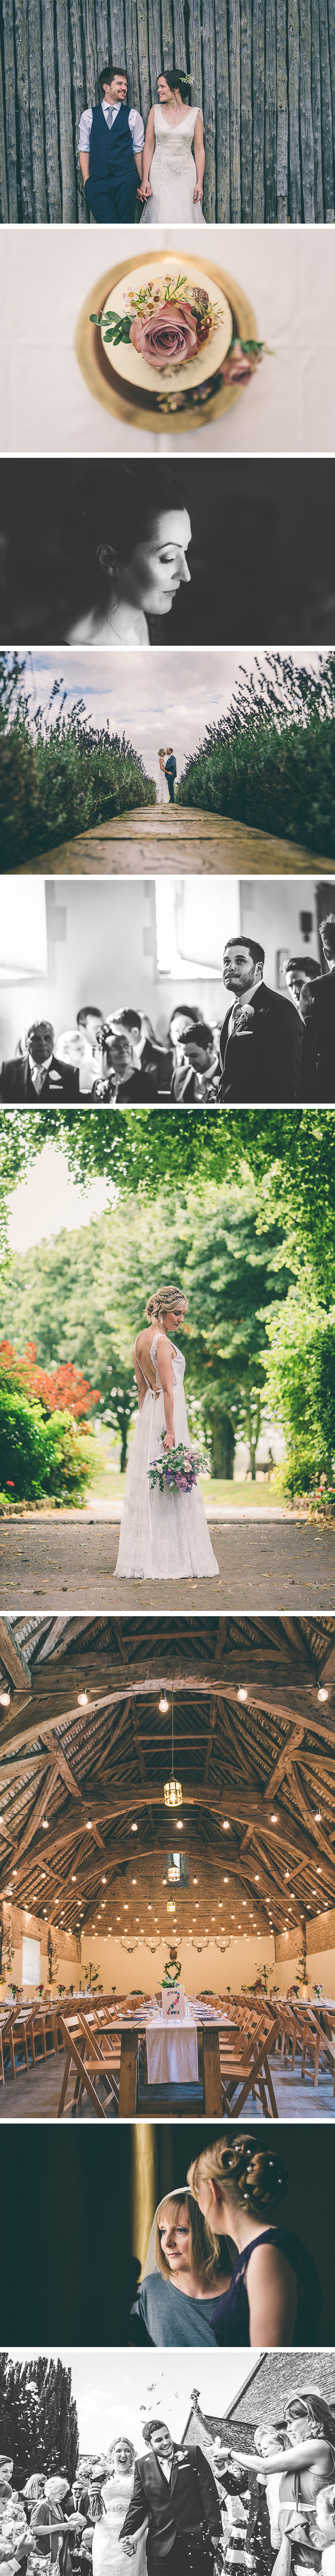 UK Wedding Review